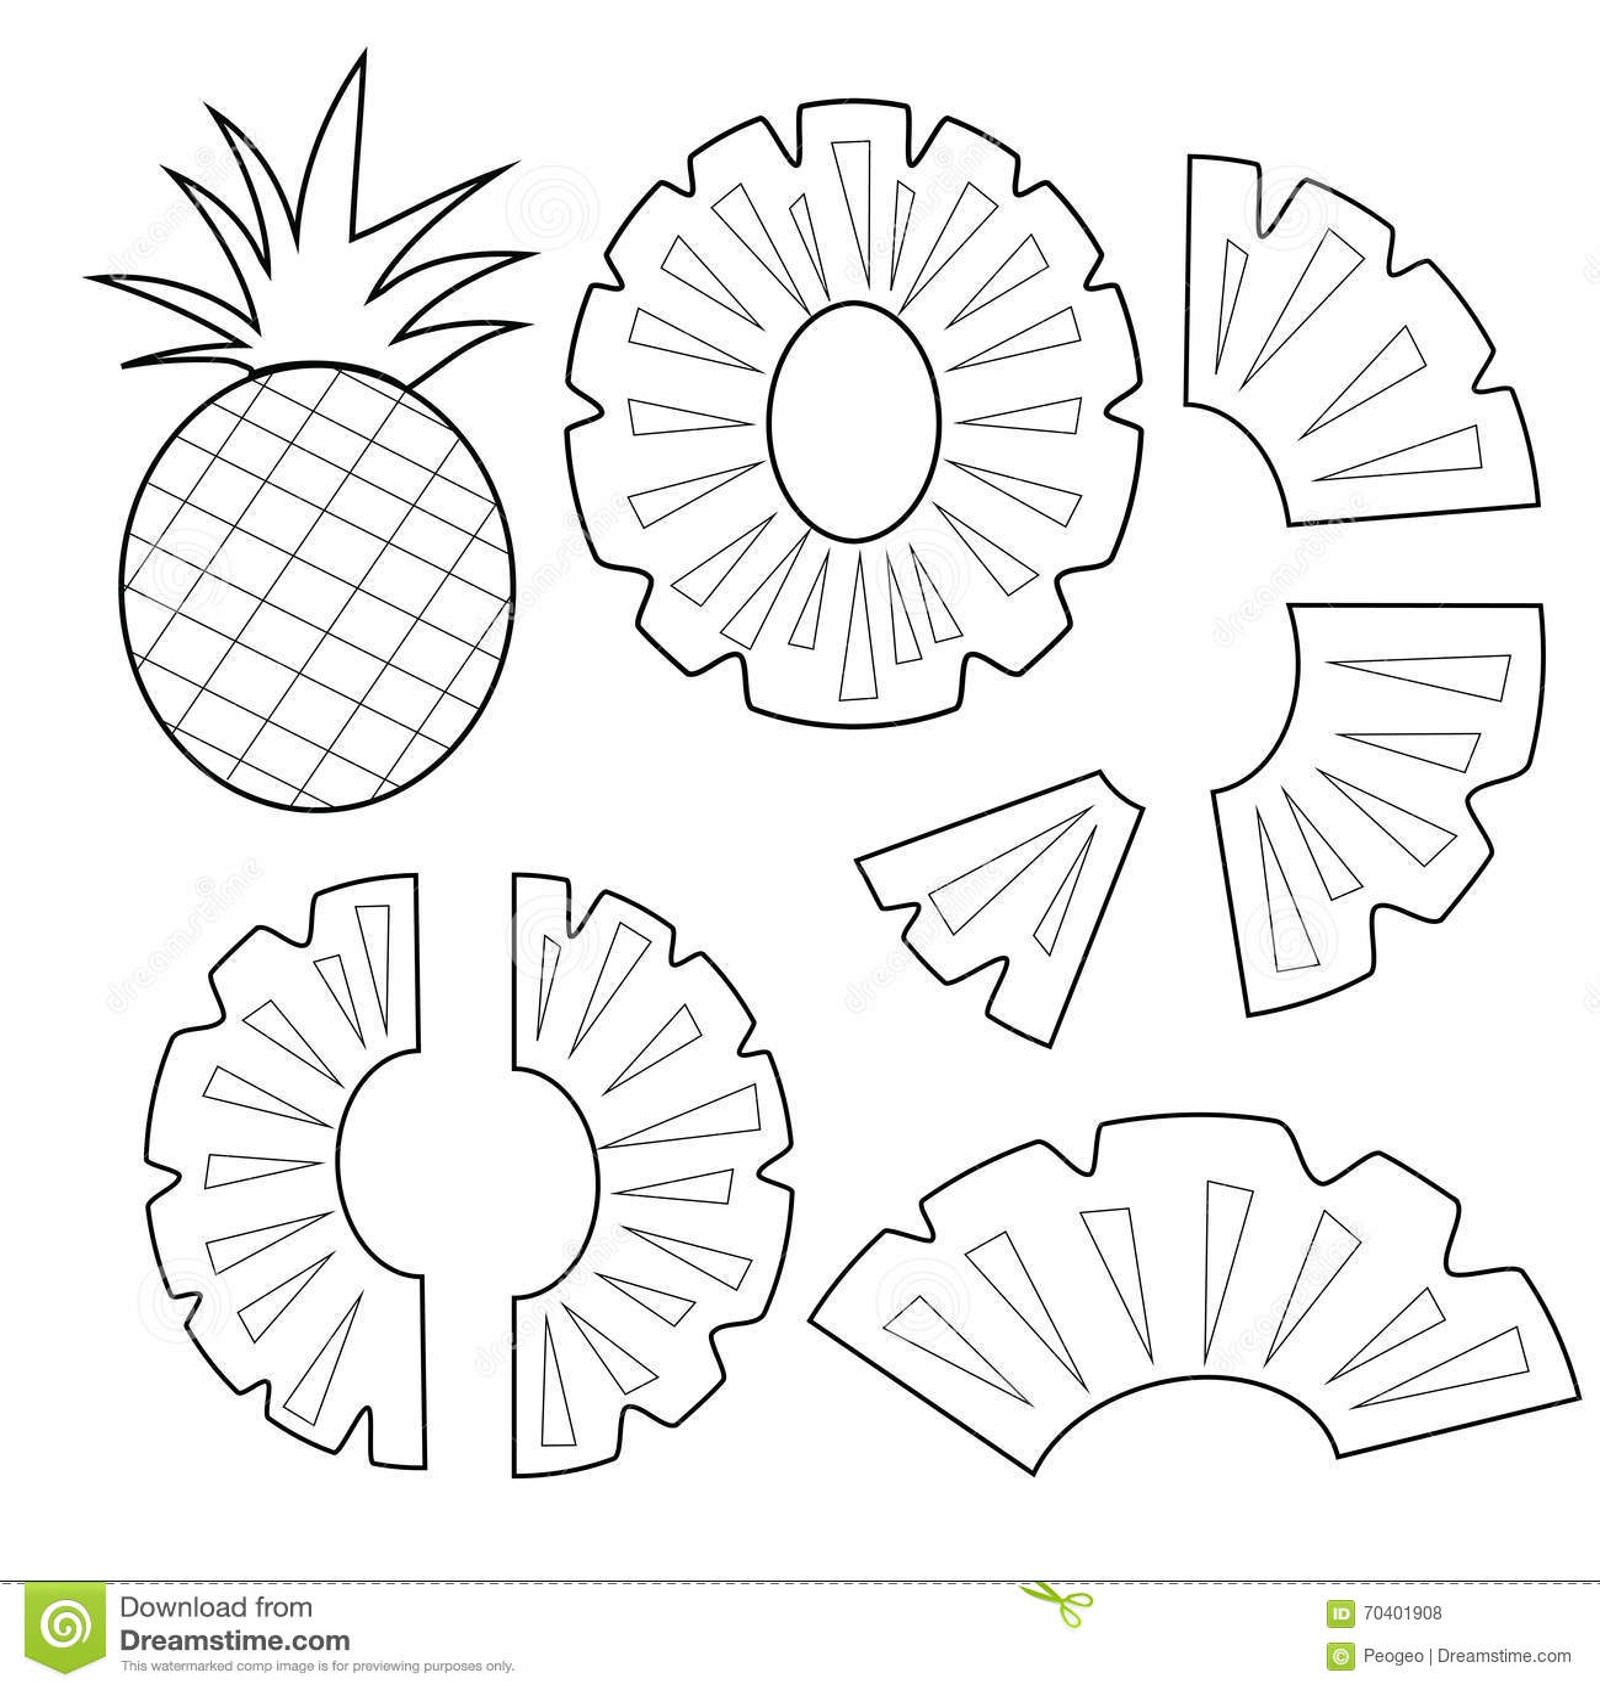 Pineapple Fruit Outline Version